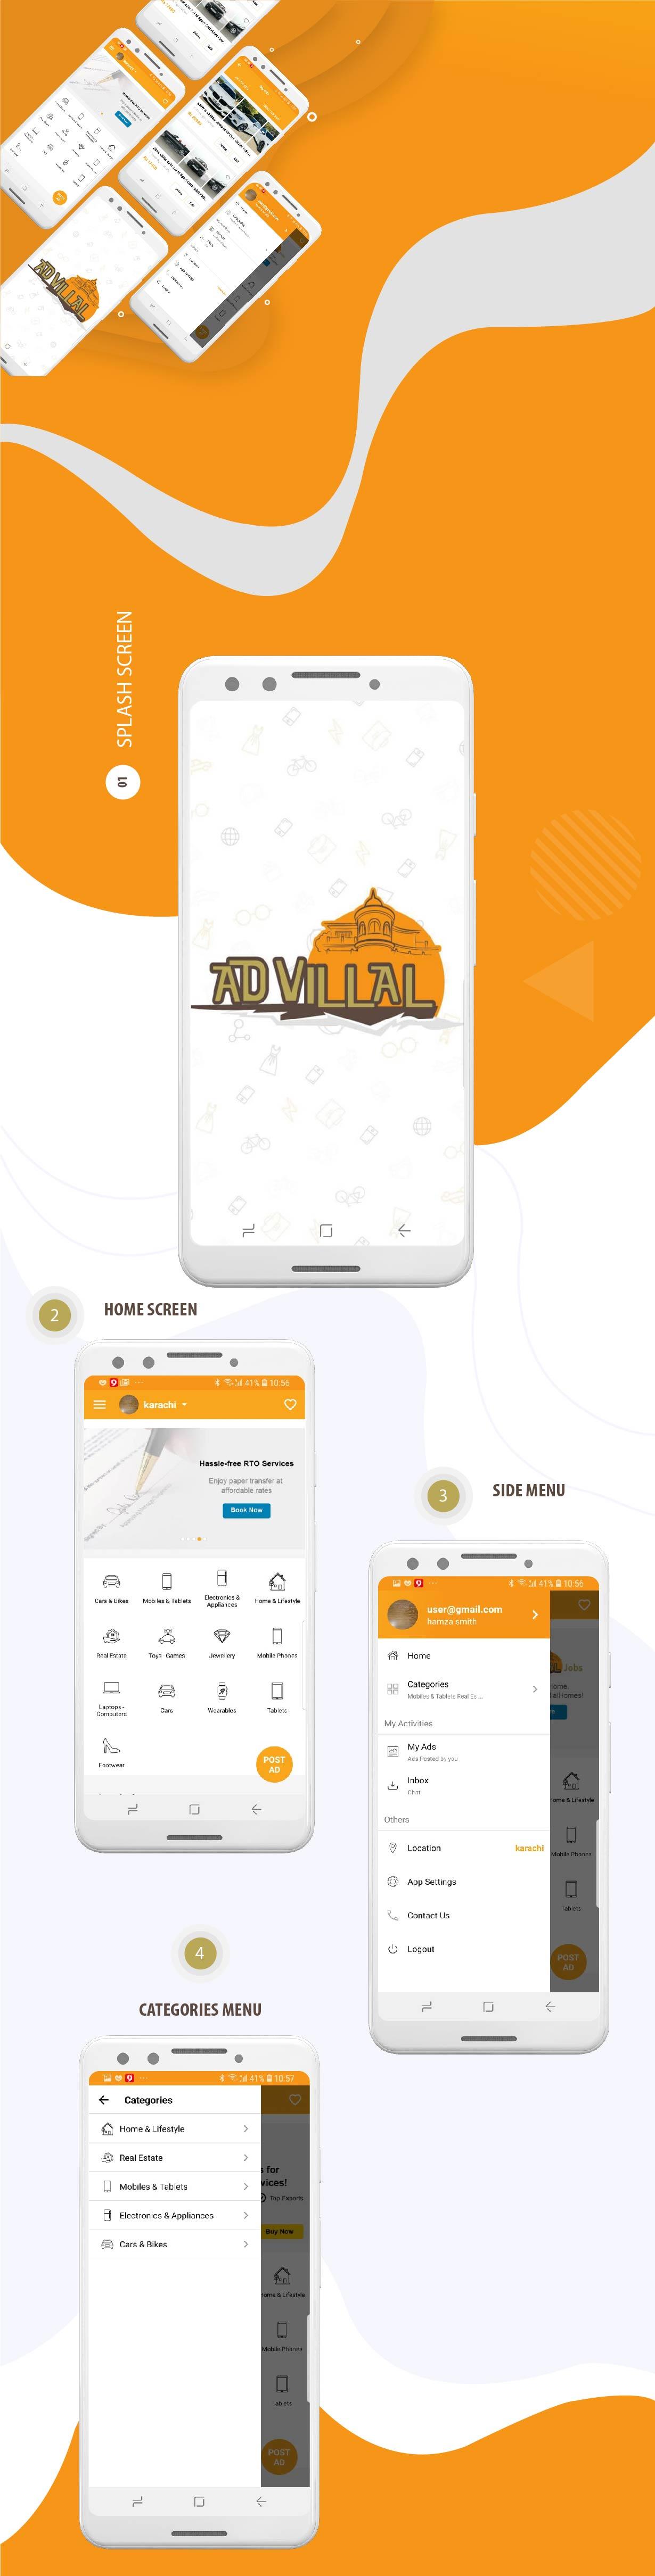 Advilla - Classified Android Native App v1.0.1 - 3